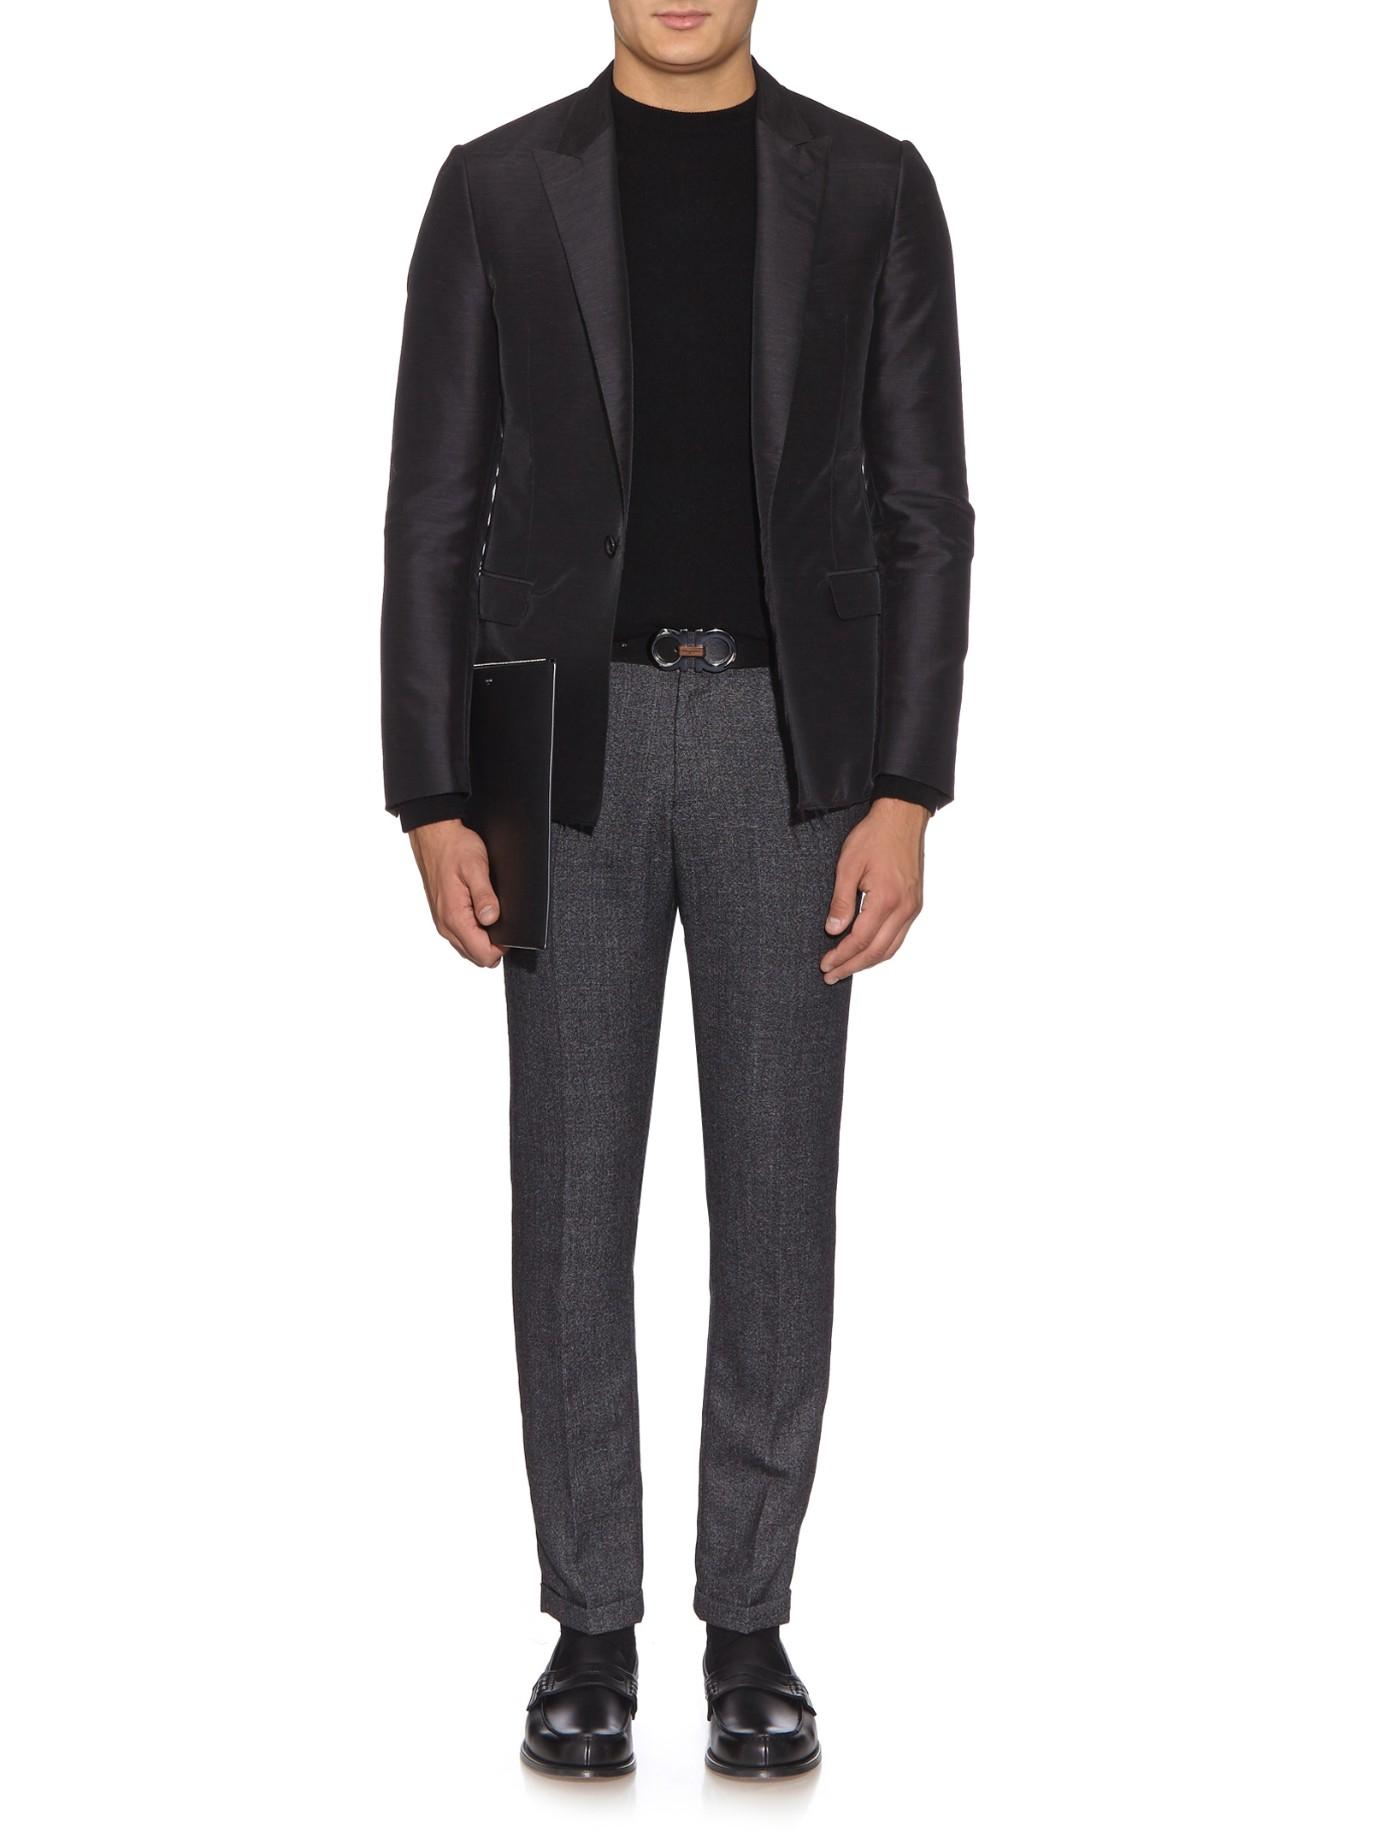 39411d30f7 Lyst - Ferragamo Reversible Leather Belt in Black for Men